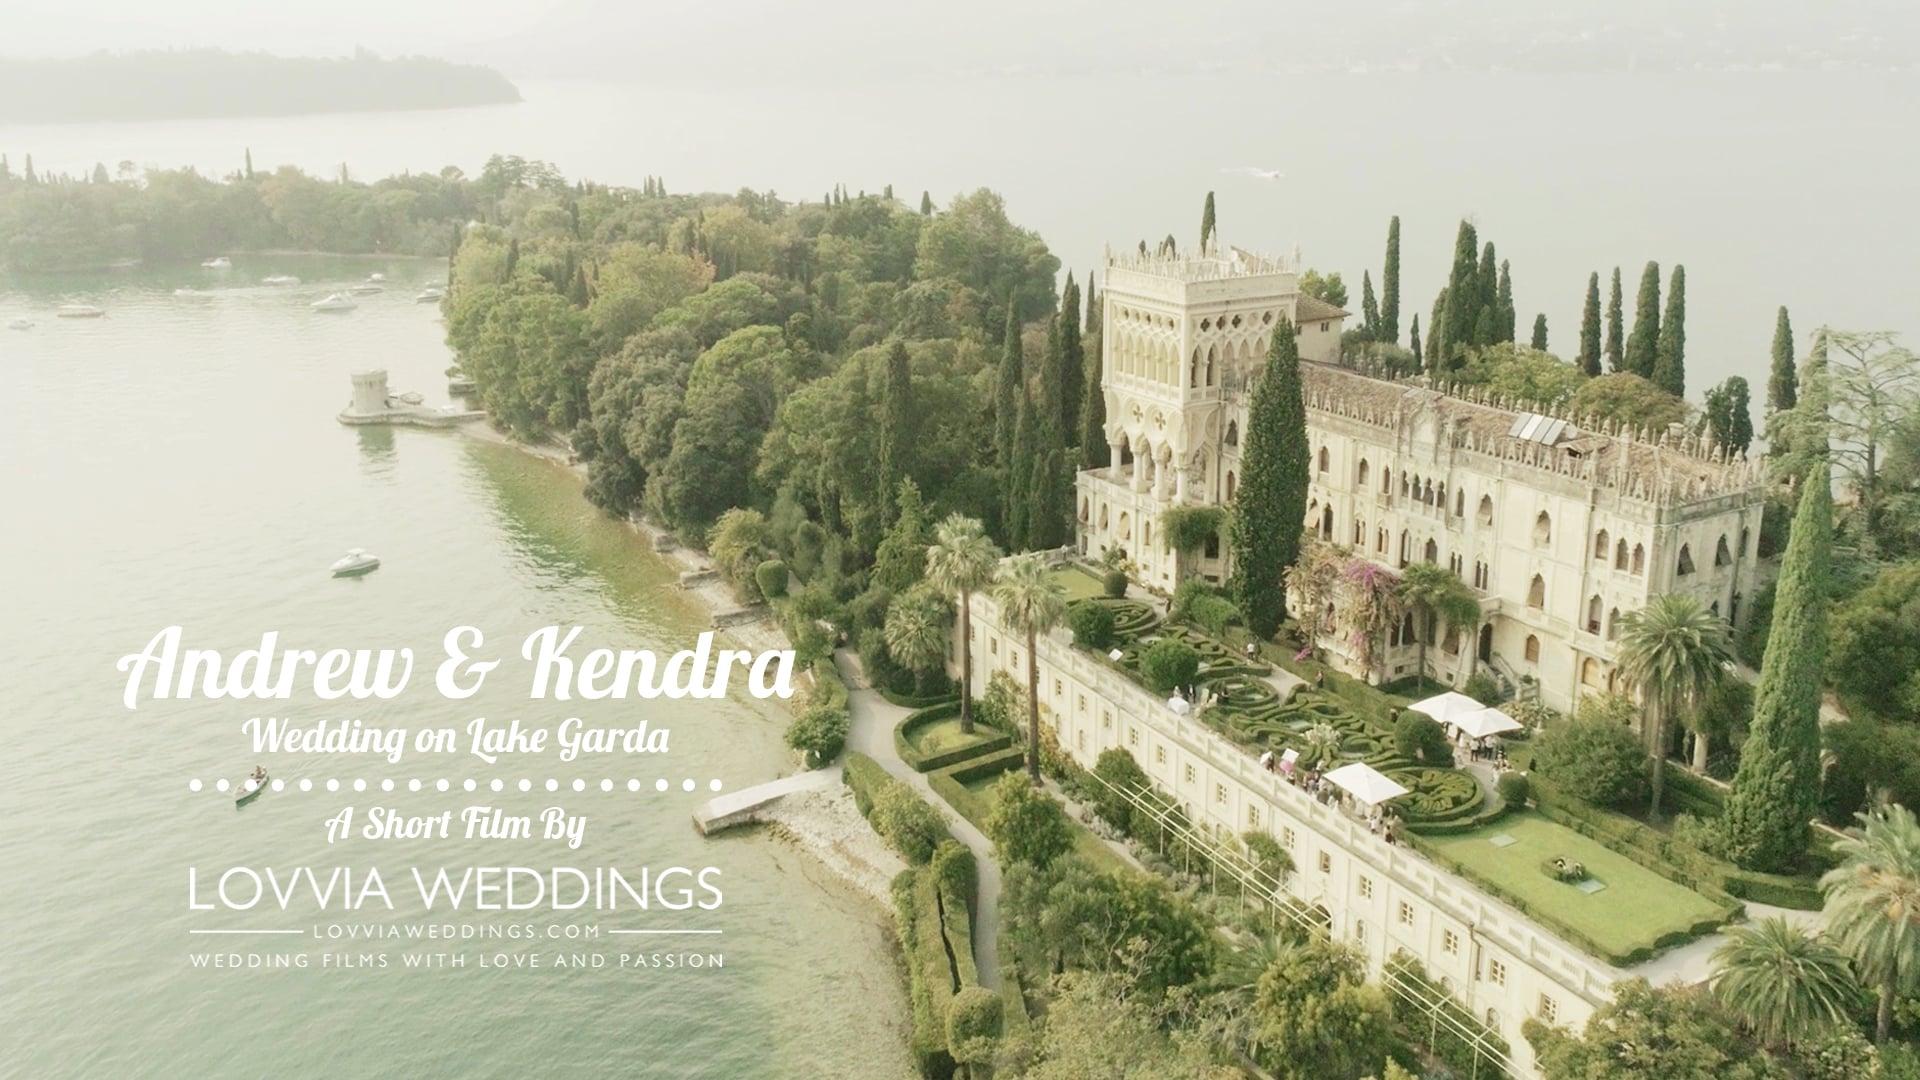 Wedding video on Lake Garda • Isola Cavazza • Italy / Andrew & Kendra (Coming soon trailer) lovviaweddings.com